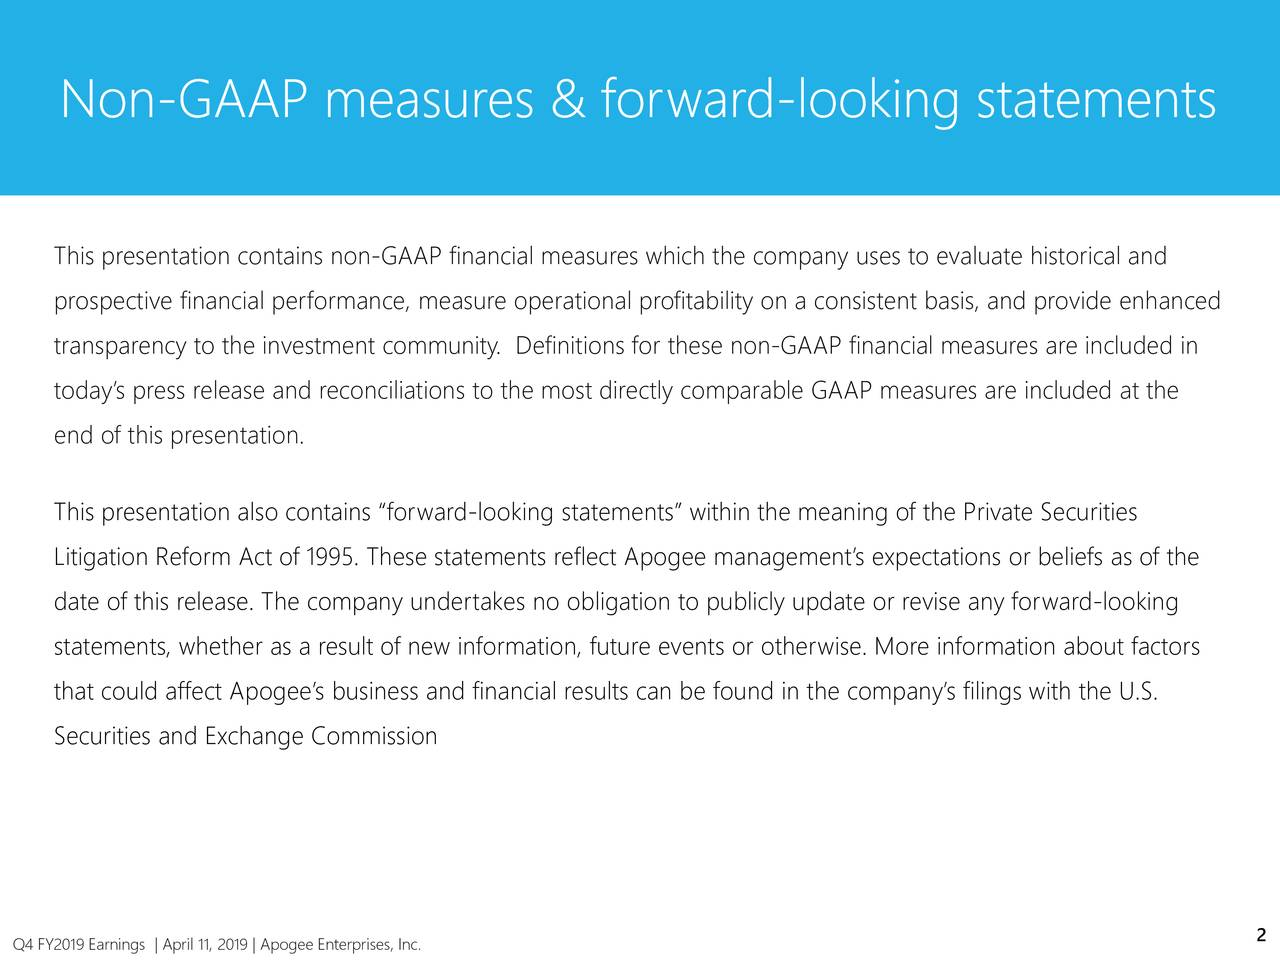 Non-GAAP measures & forward-looking statements